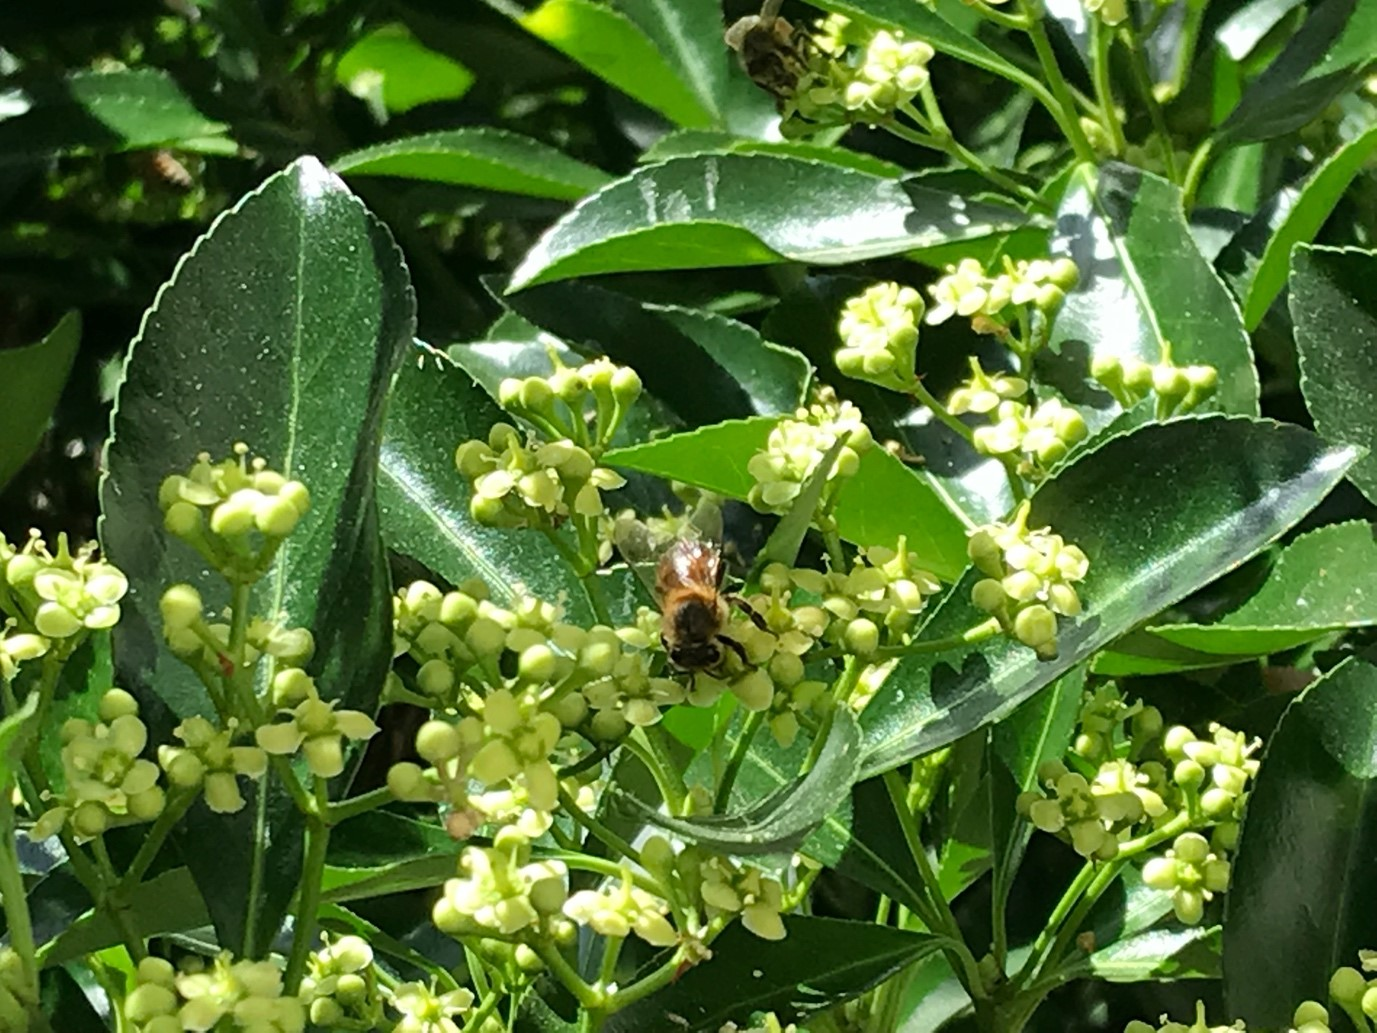 Pollination : A major contributor to biodiversity